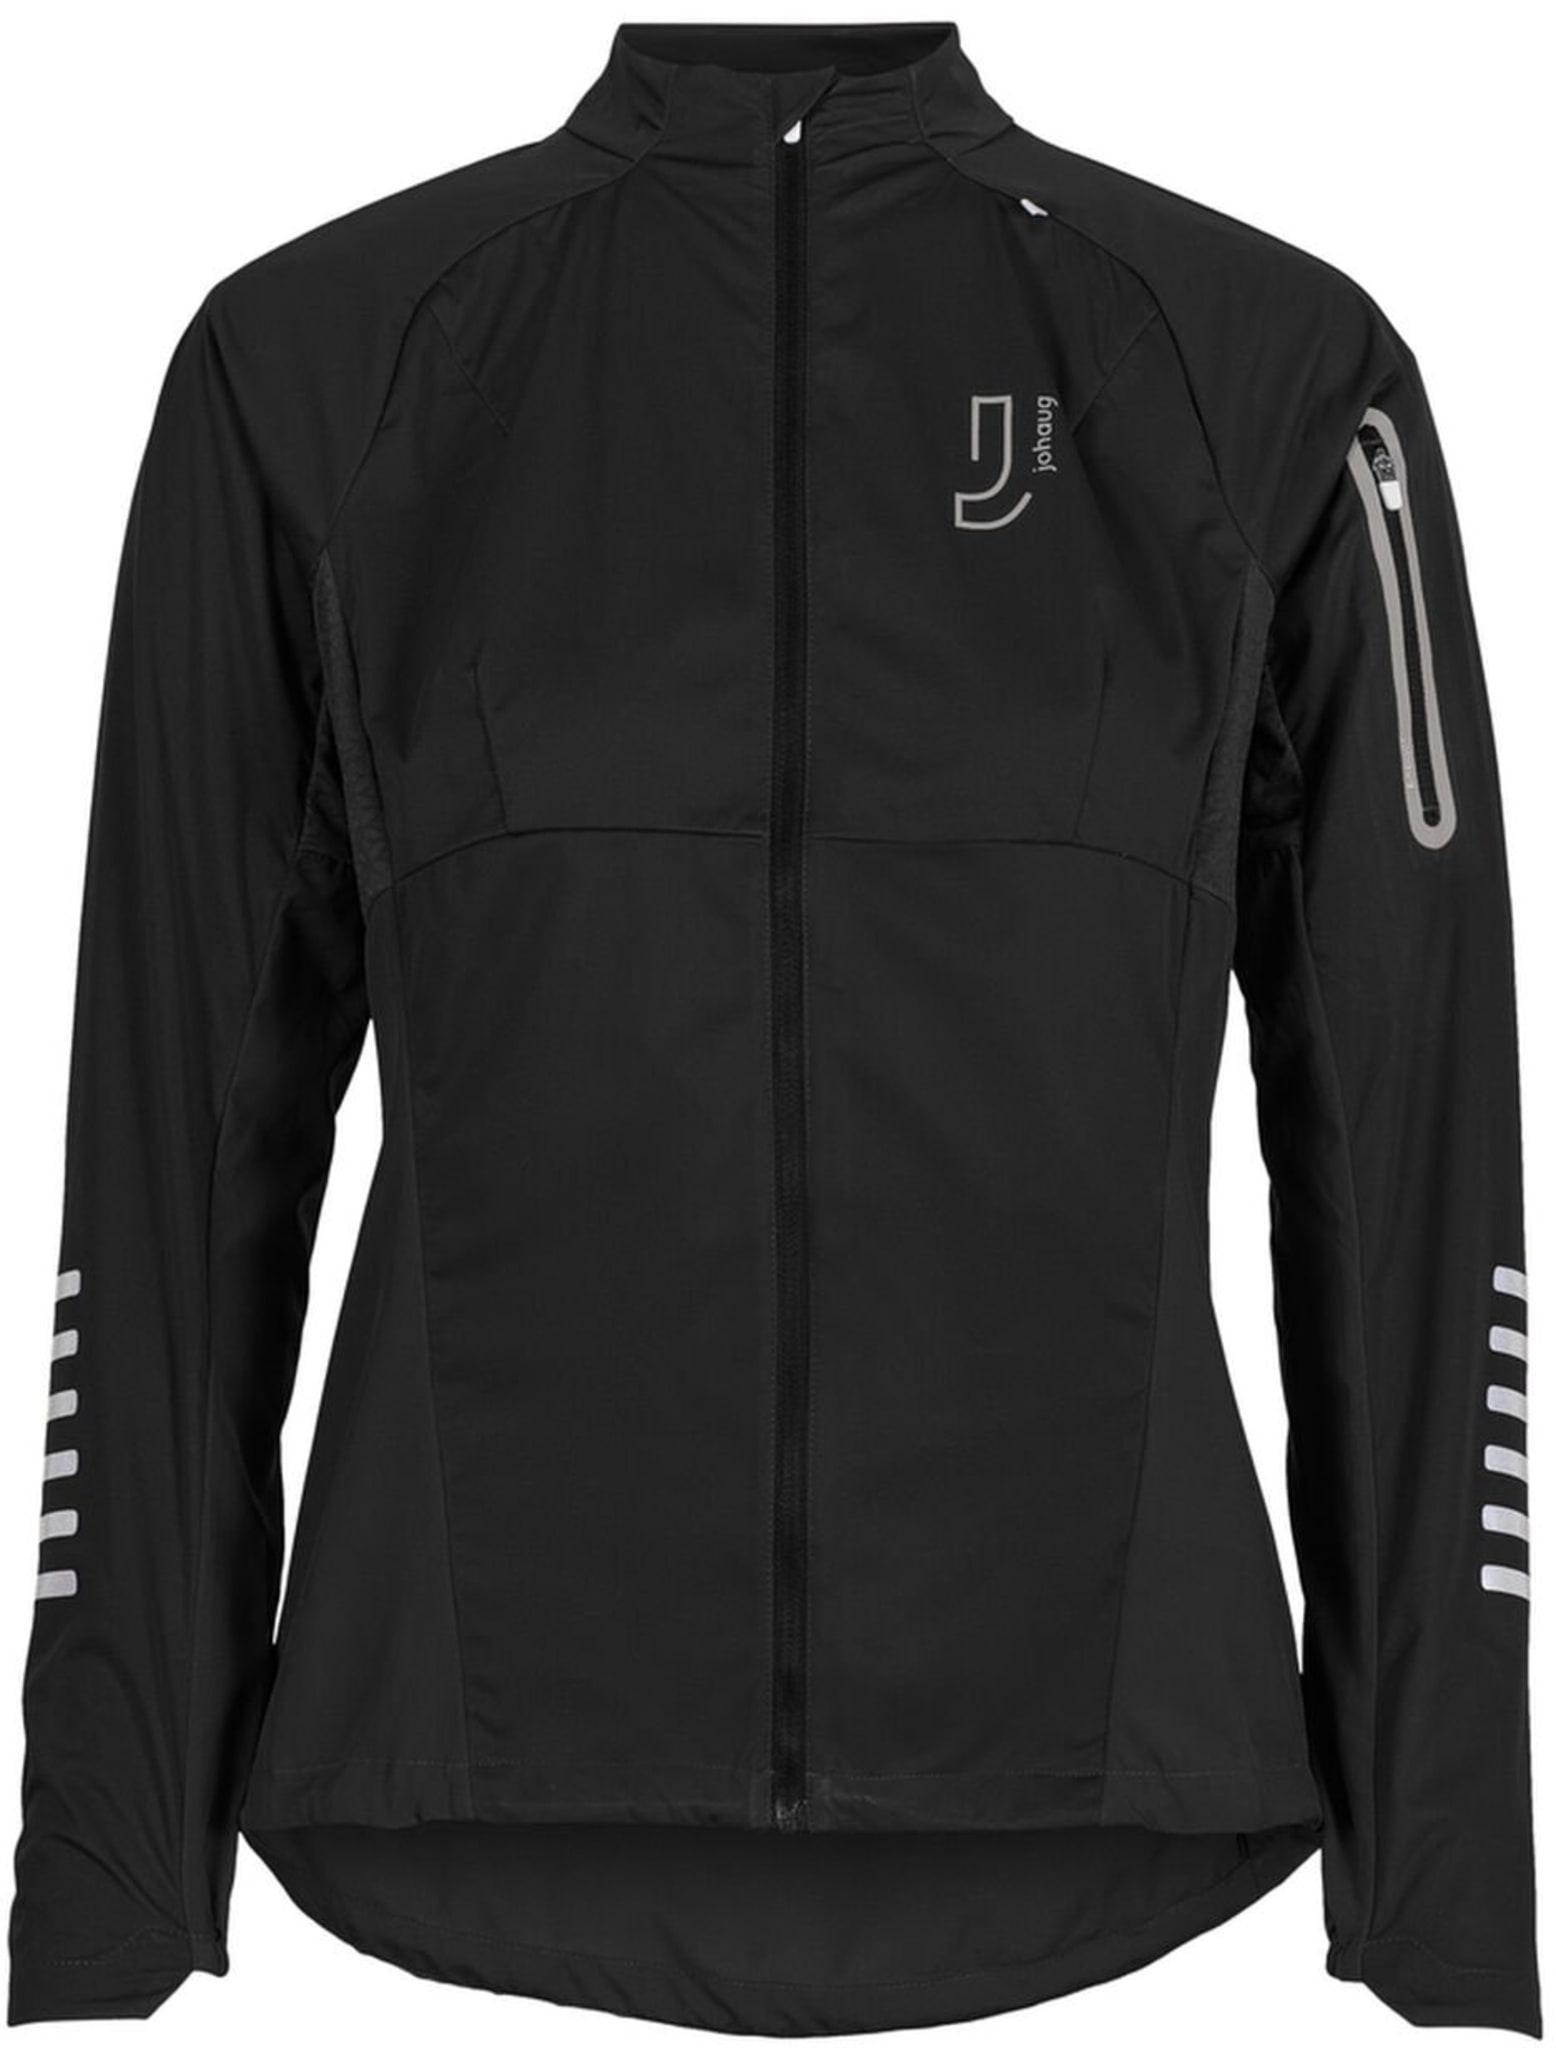 Discipline Jacket